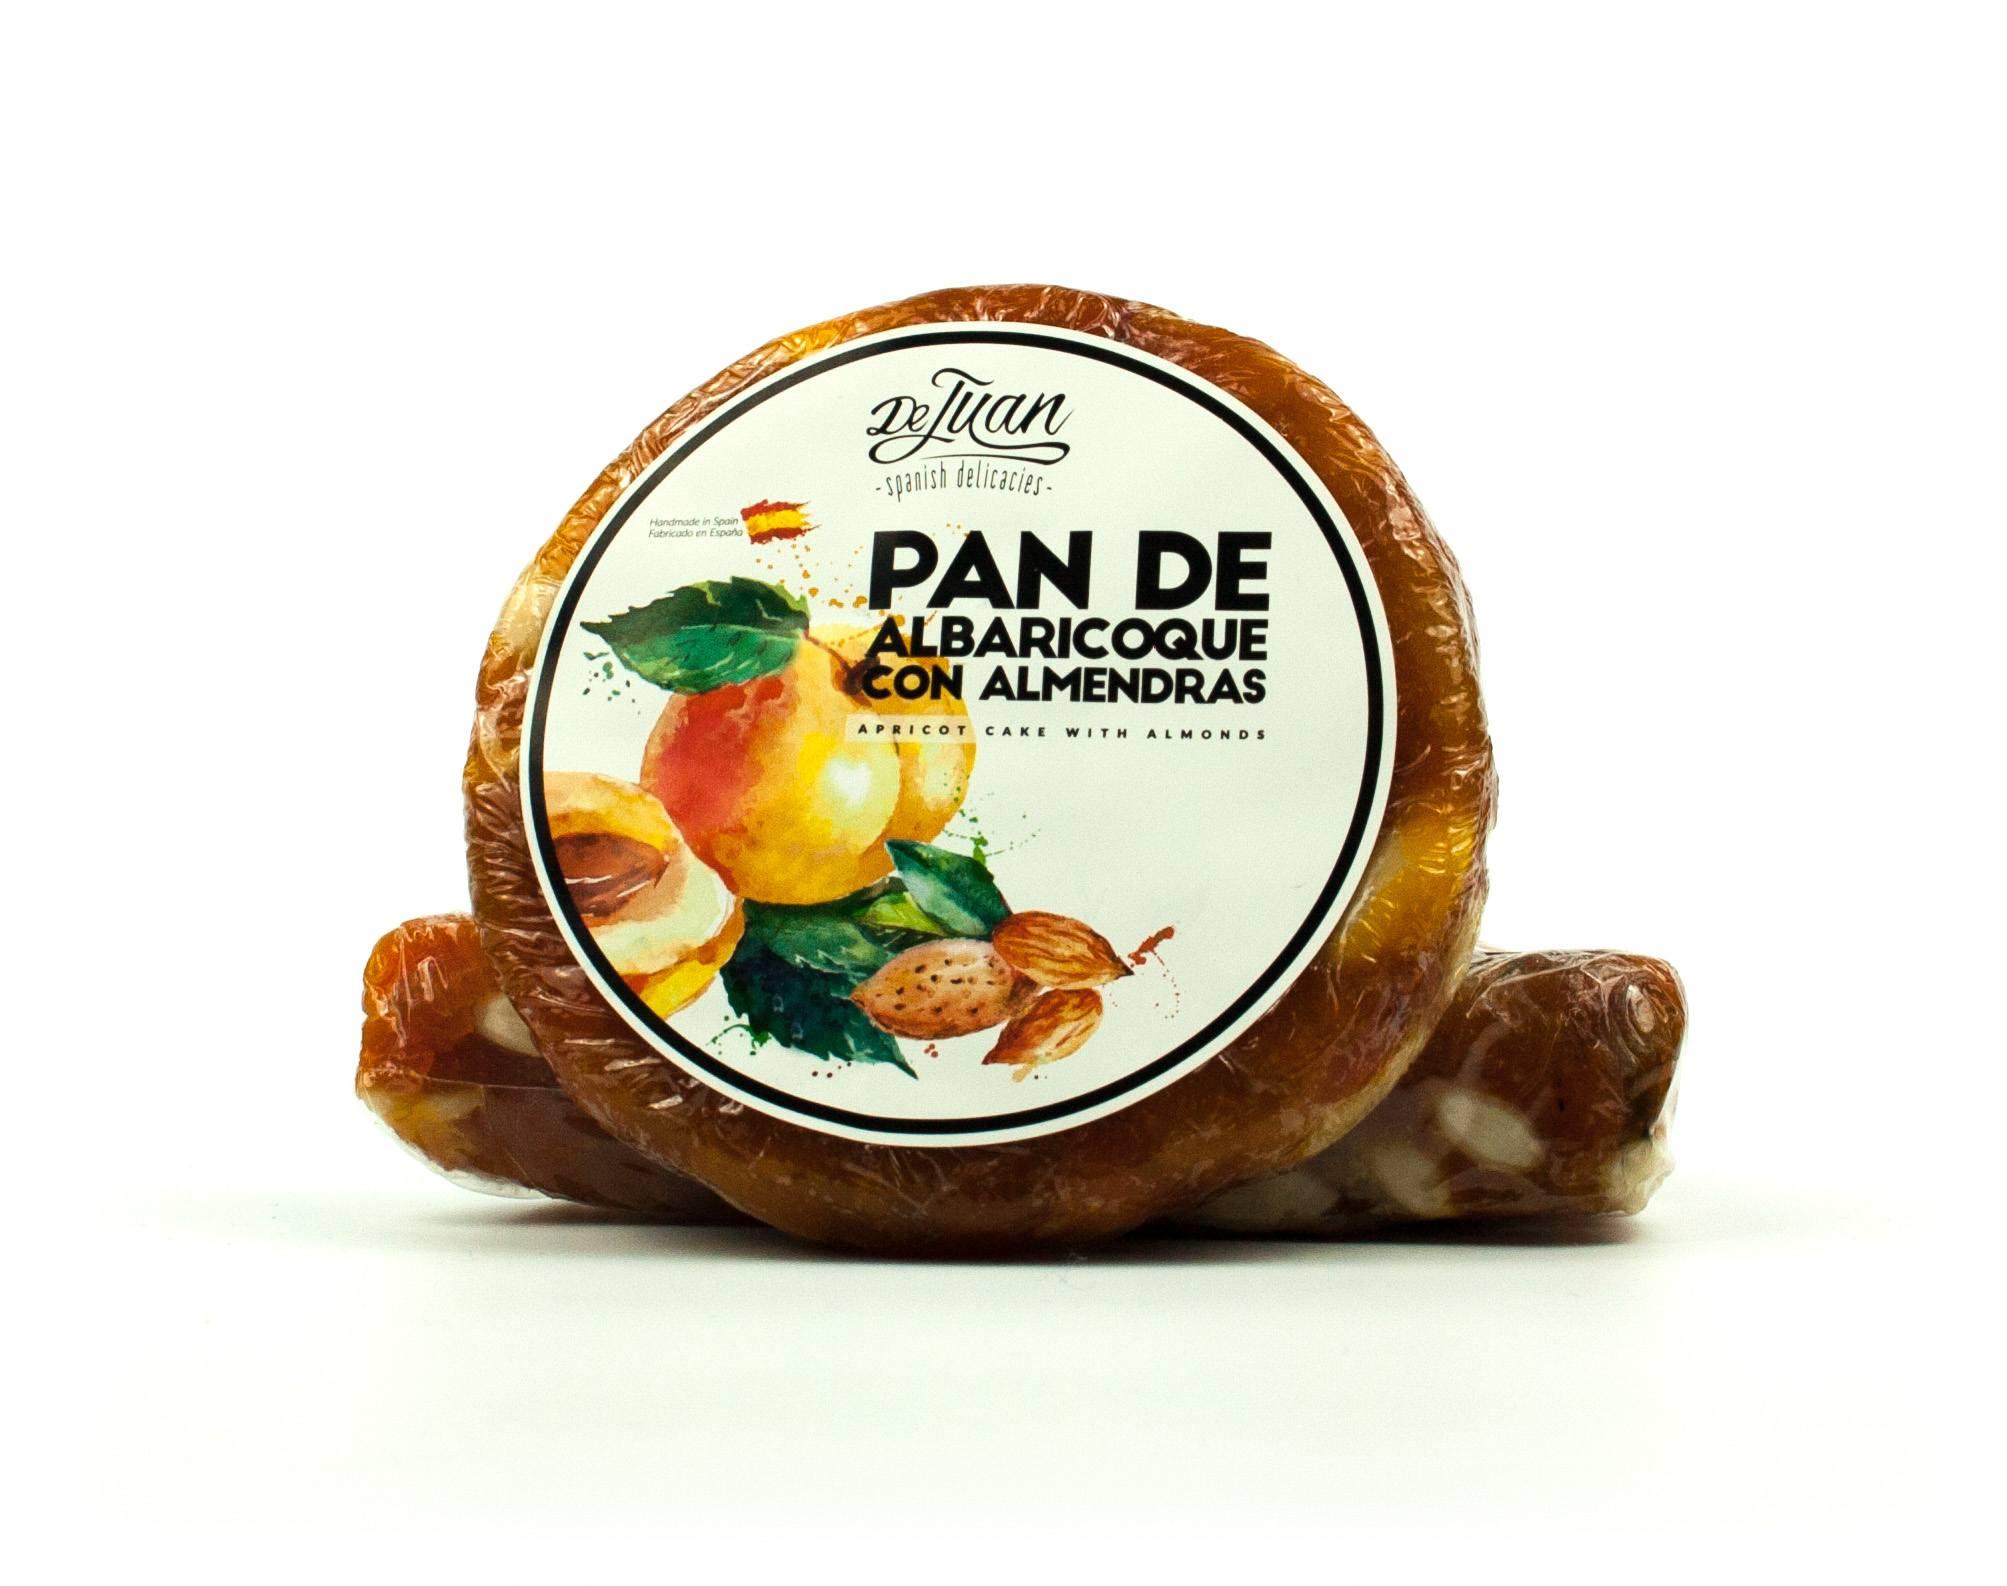 Pan de Albaricoque con Almendras